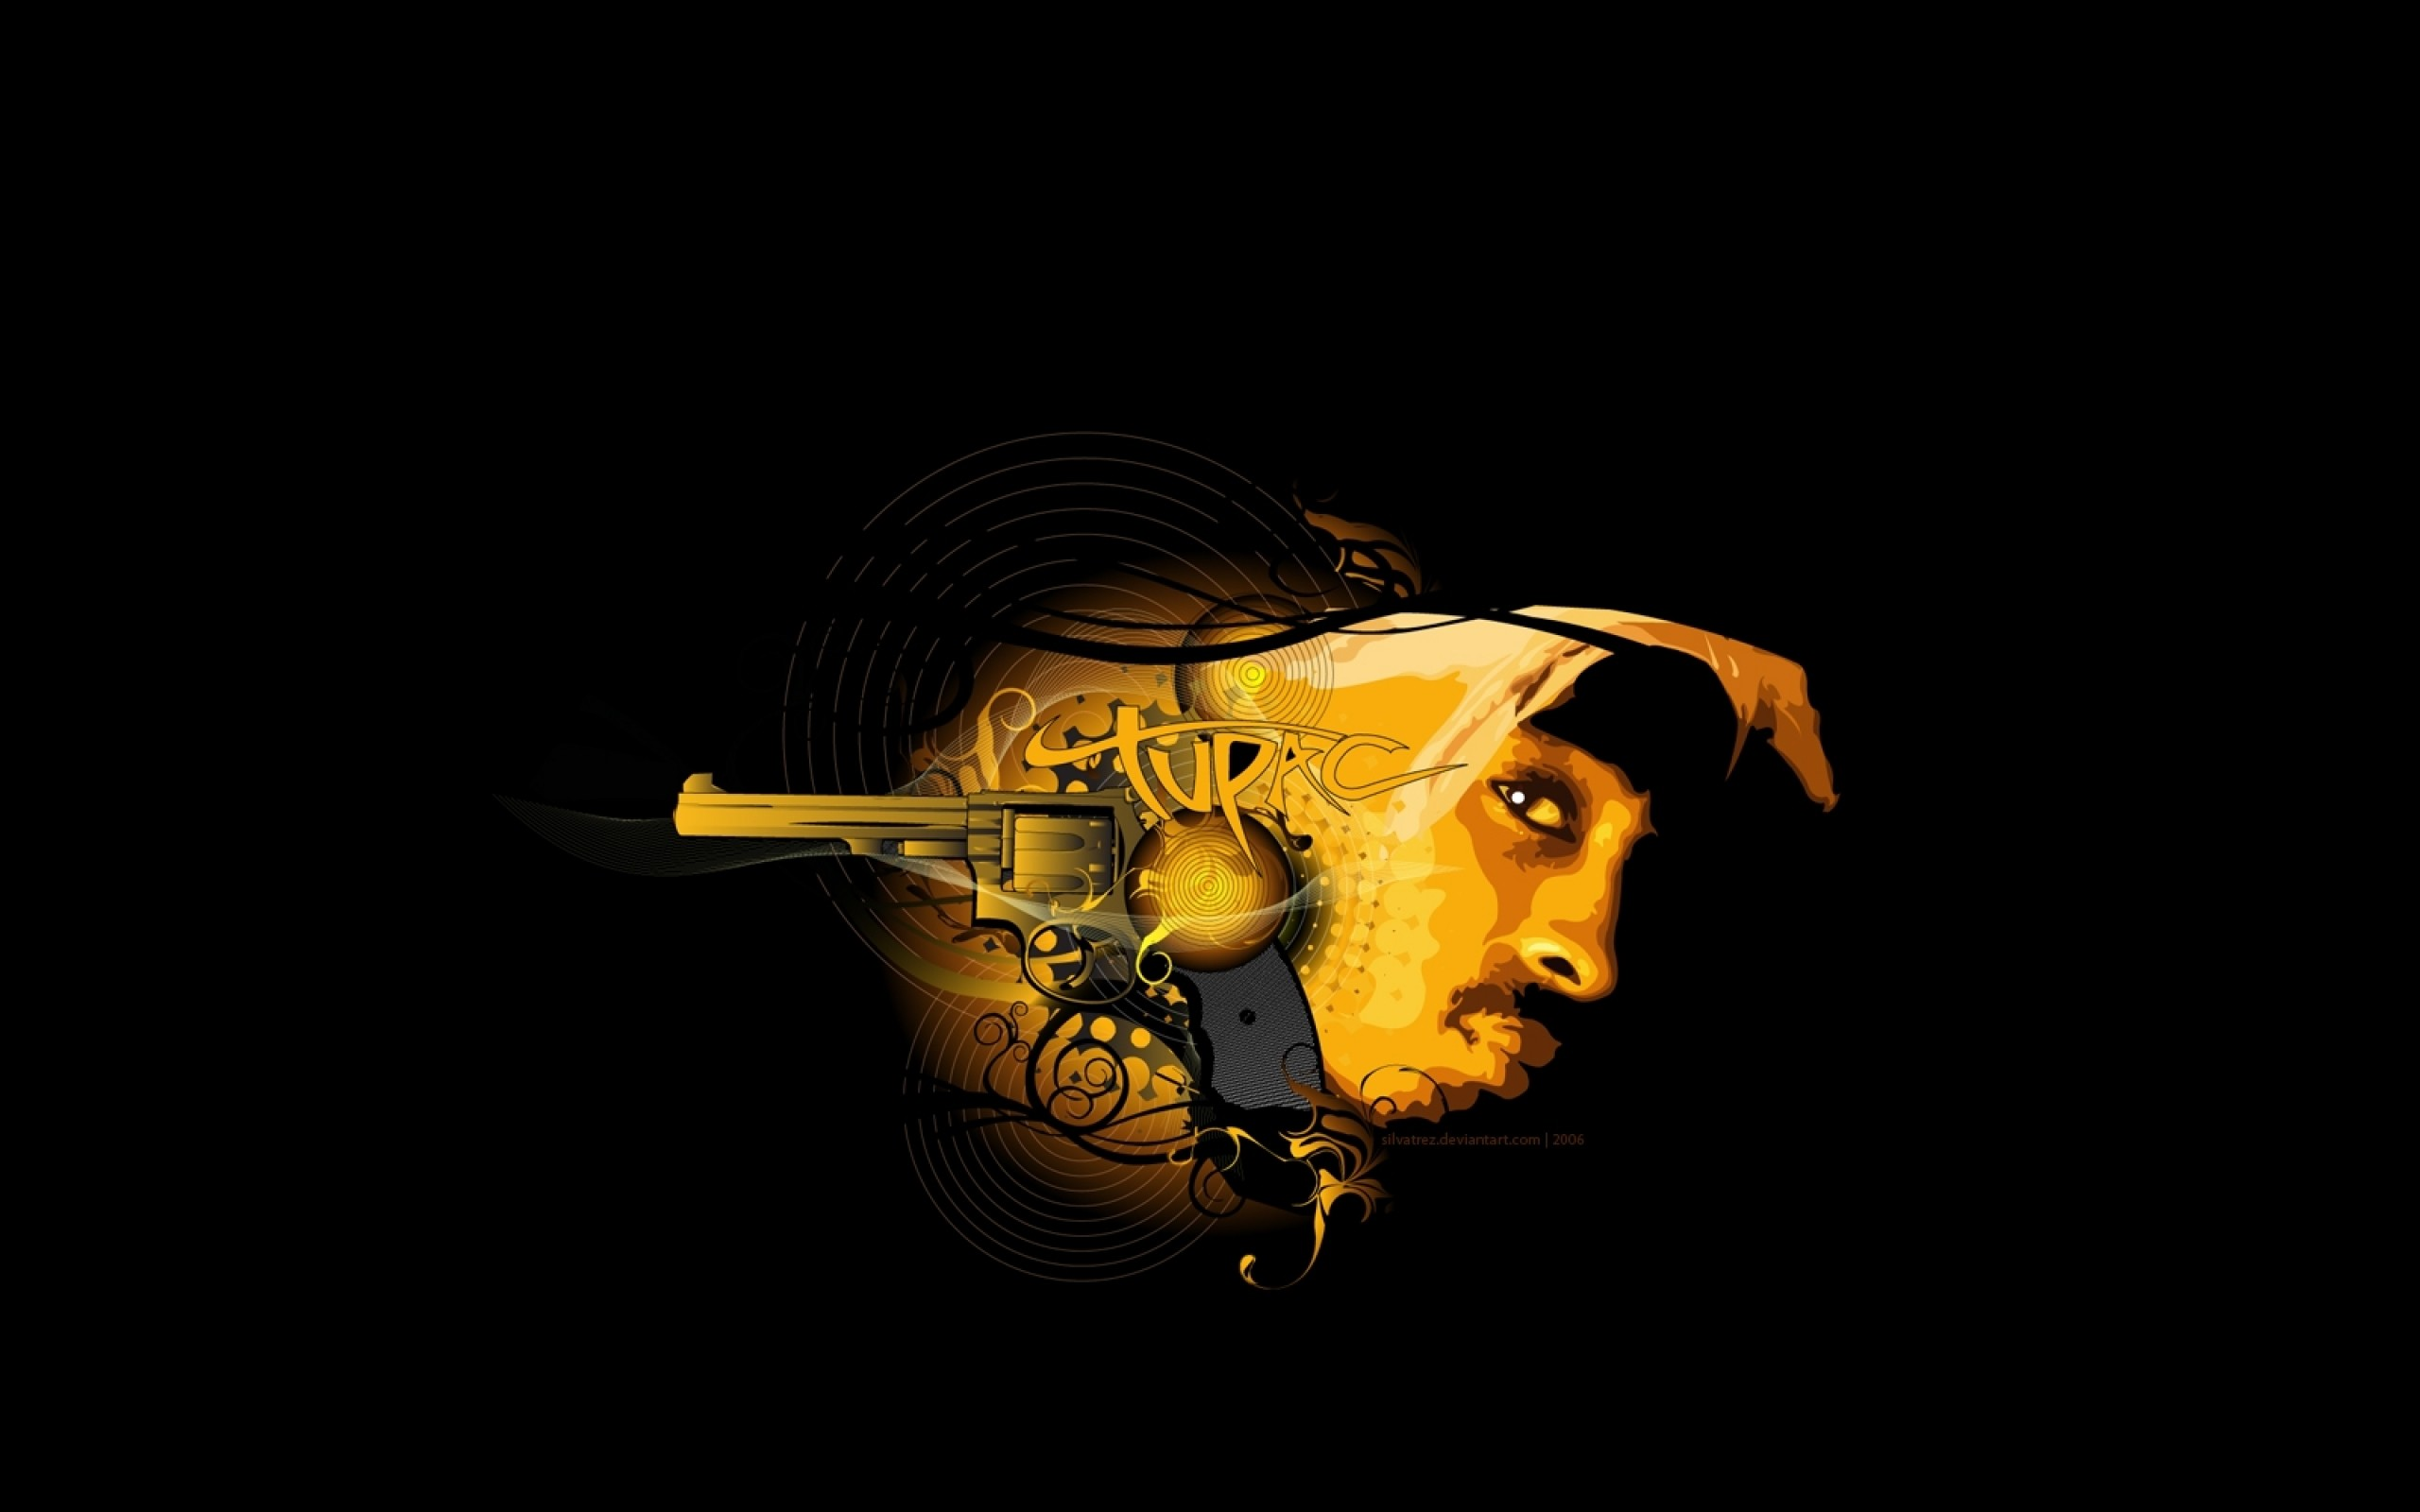 music hip hop rap 2pac tupac shakur 1600×1200 wallpaper Art HD Wallpaper